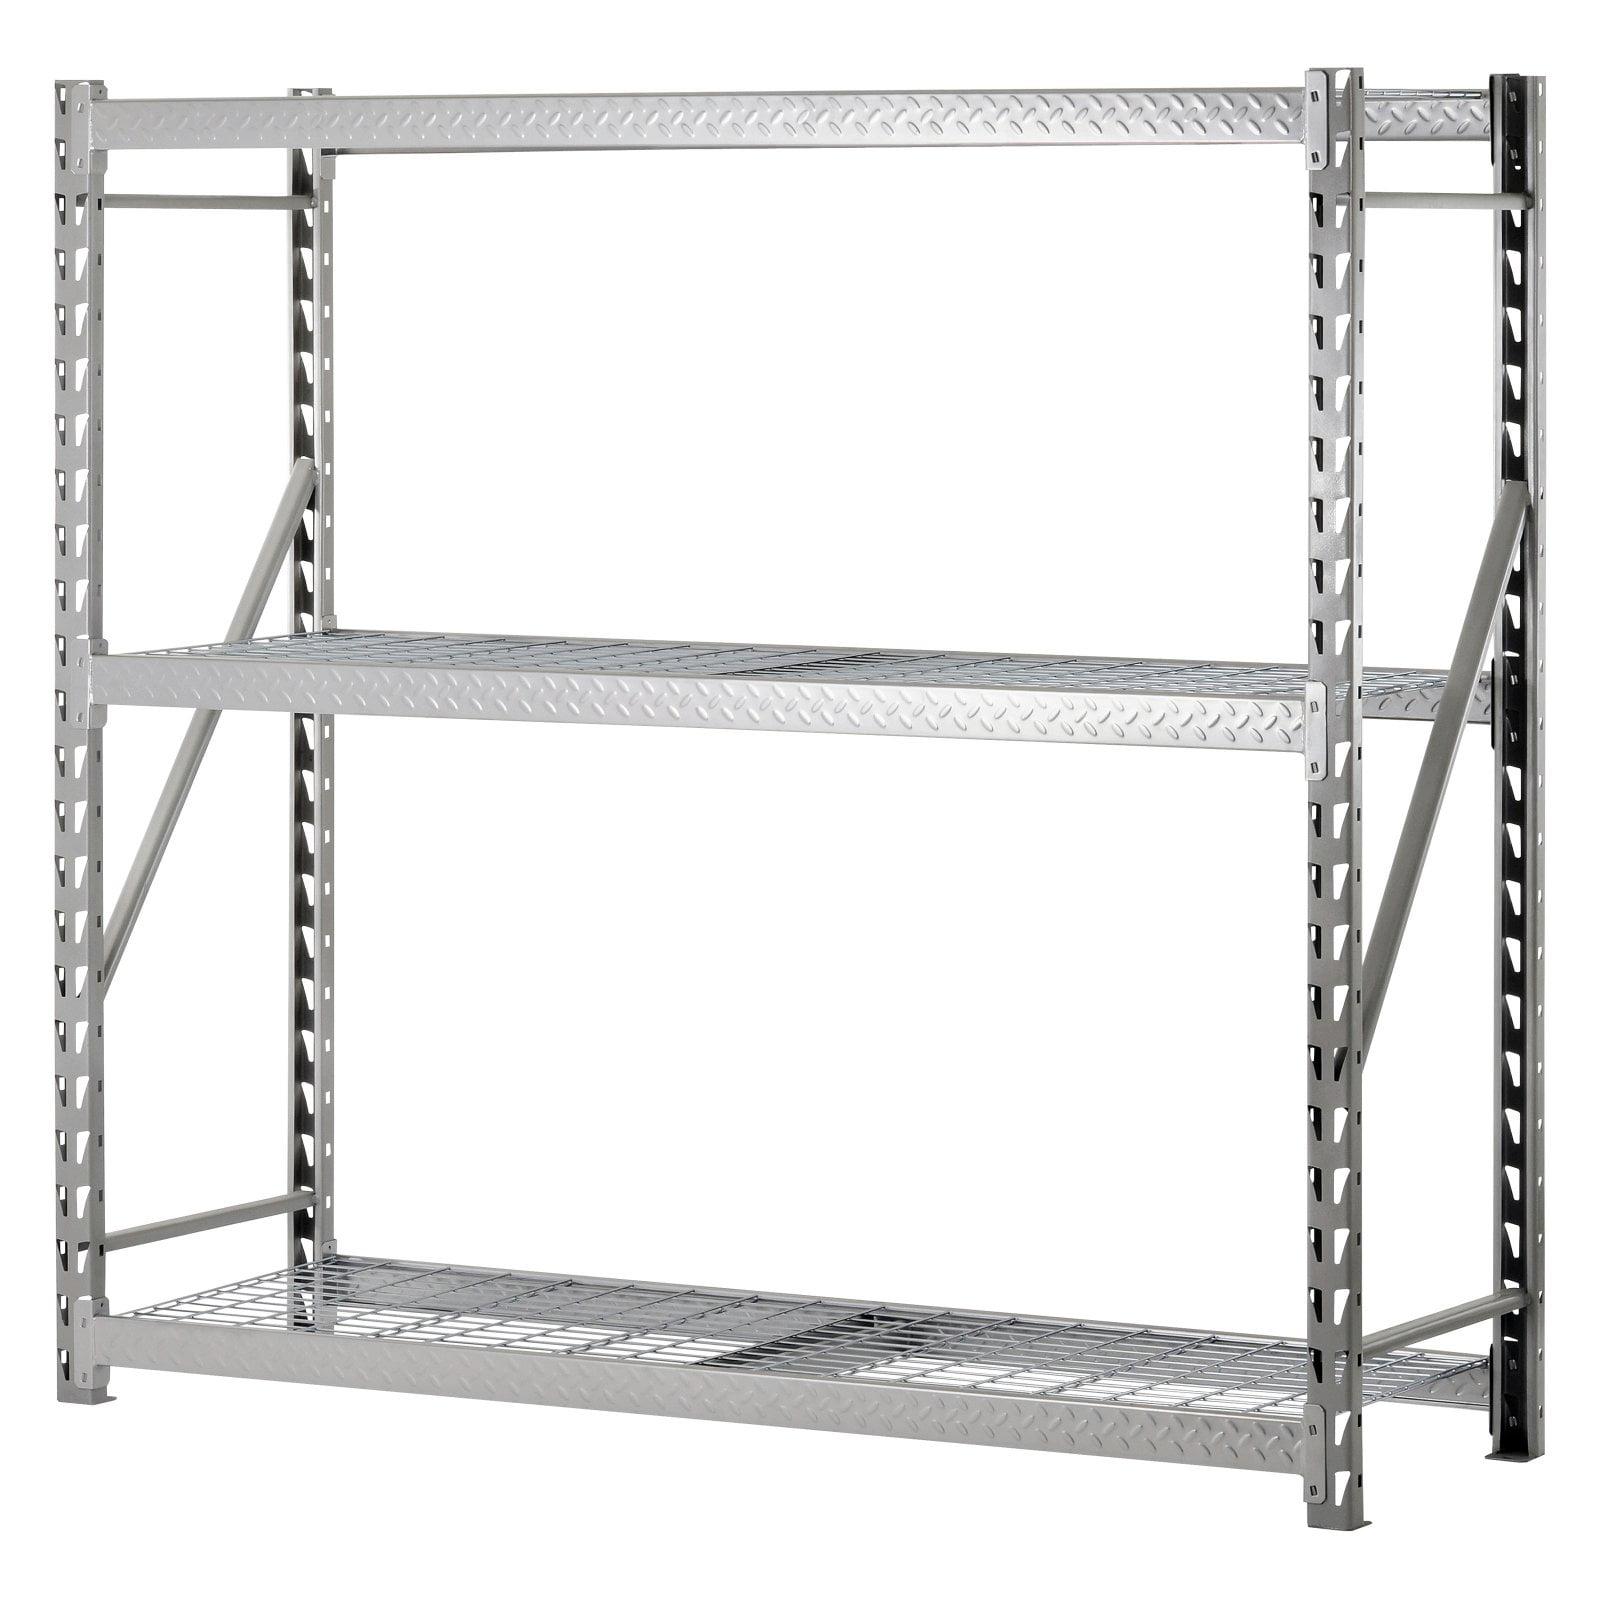 SANDUSKY LEE TP722472W3 Bulk Storage Rack, Steel, 3600 lb., Silver